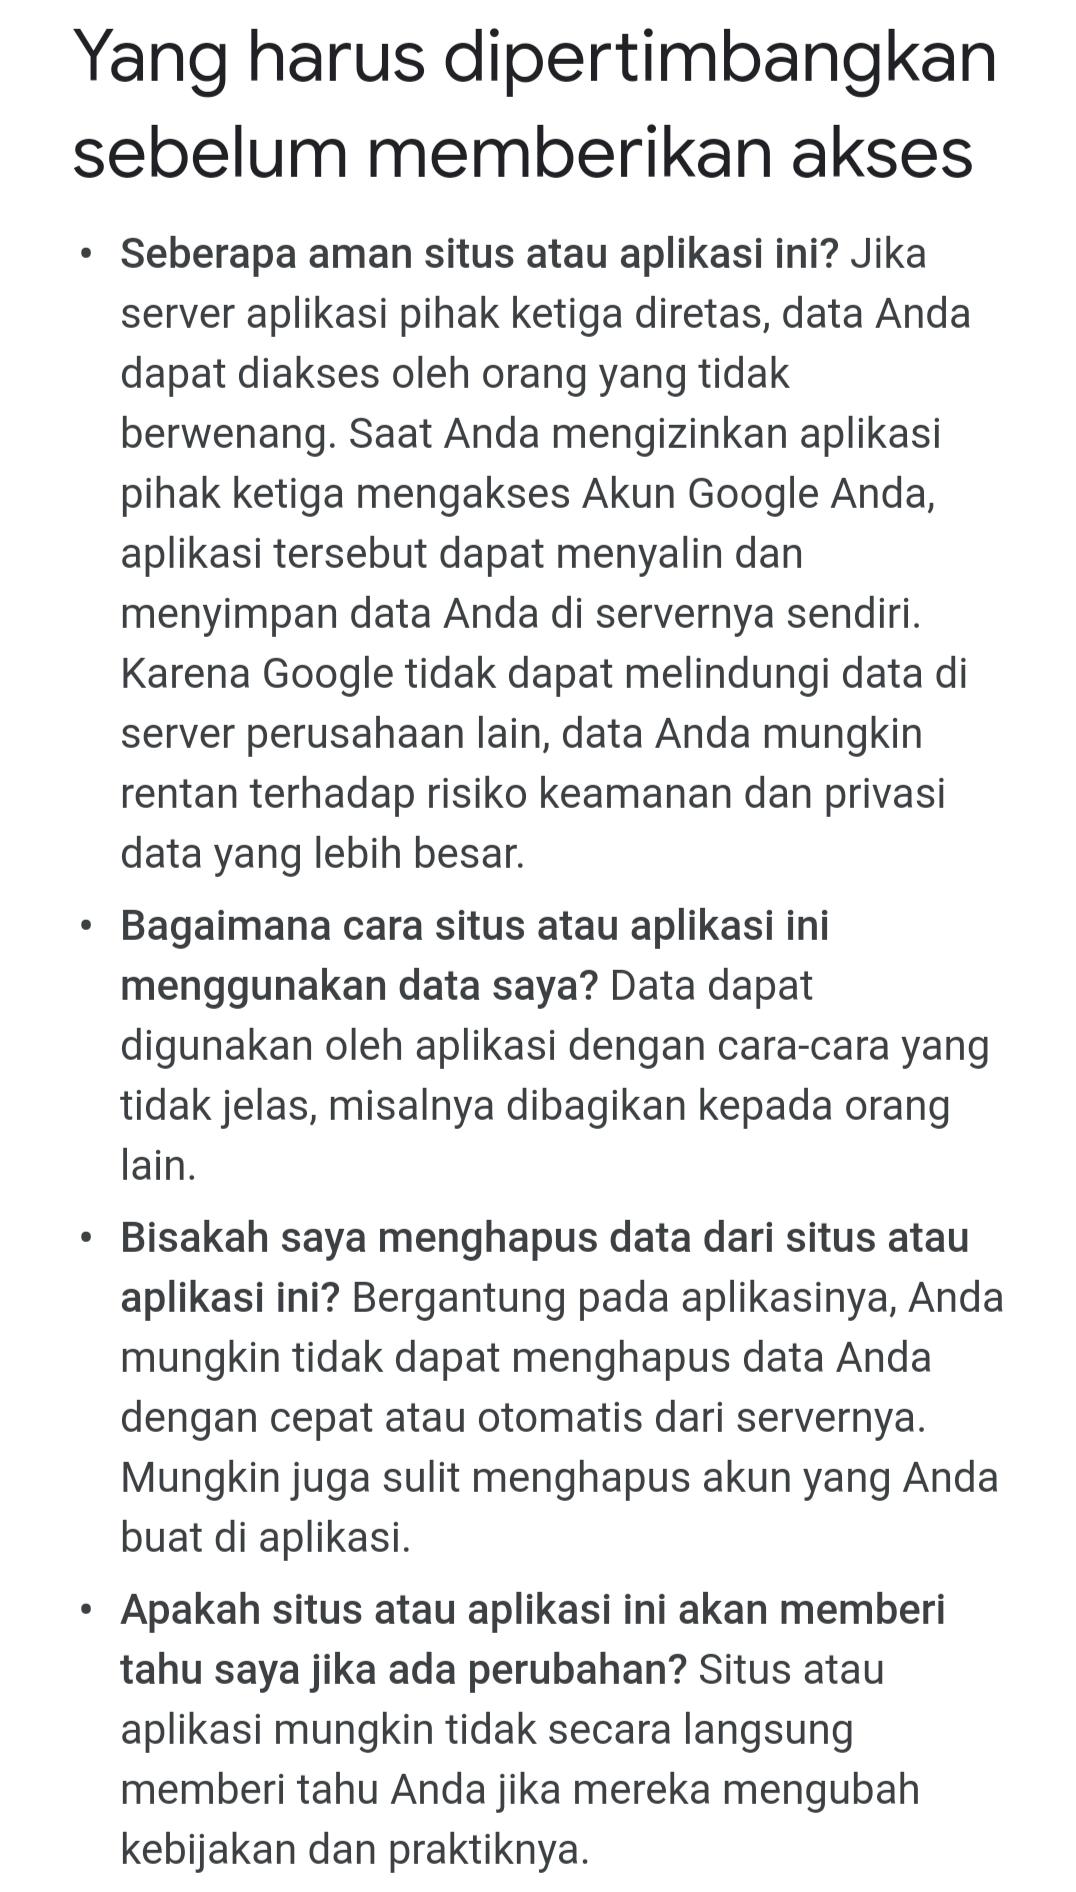 Rules Google Sebelum Memberi Akses ke Aplikasi Tertentu.jpg